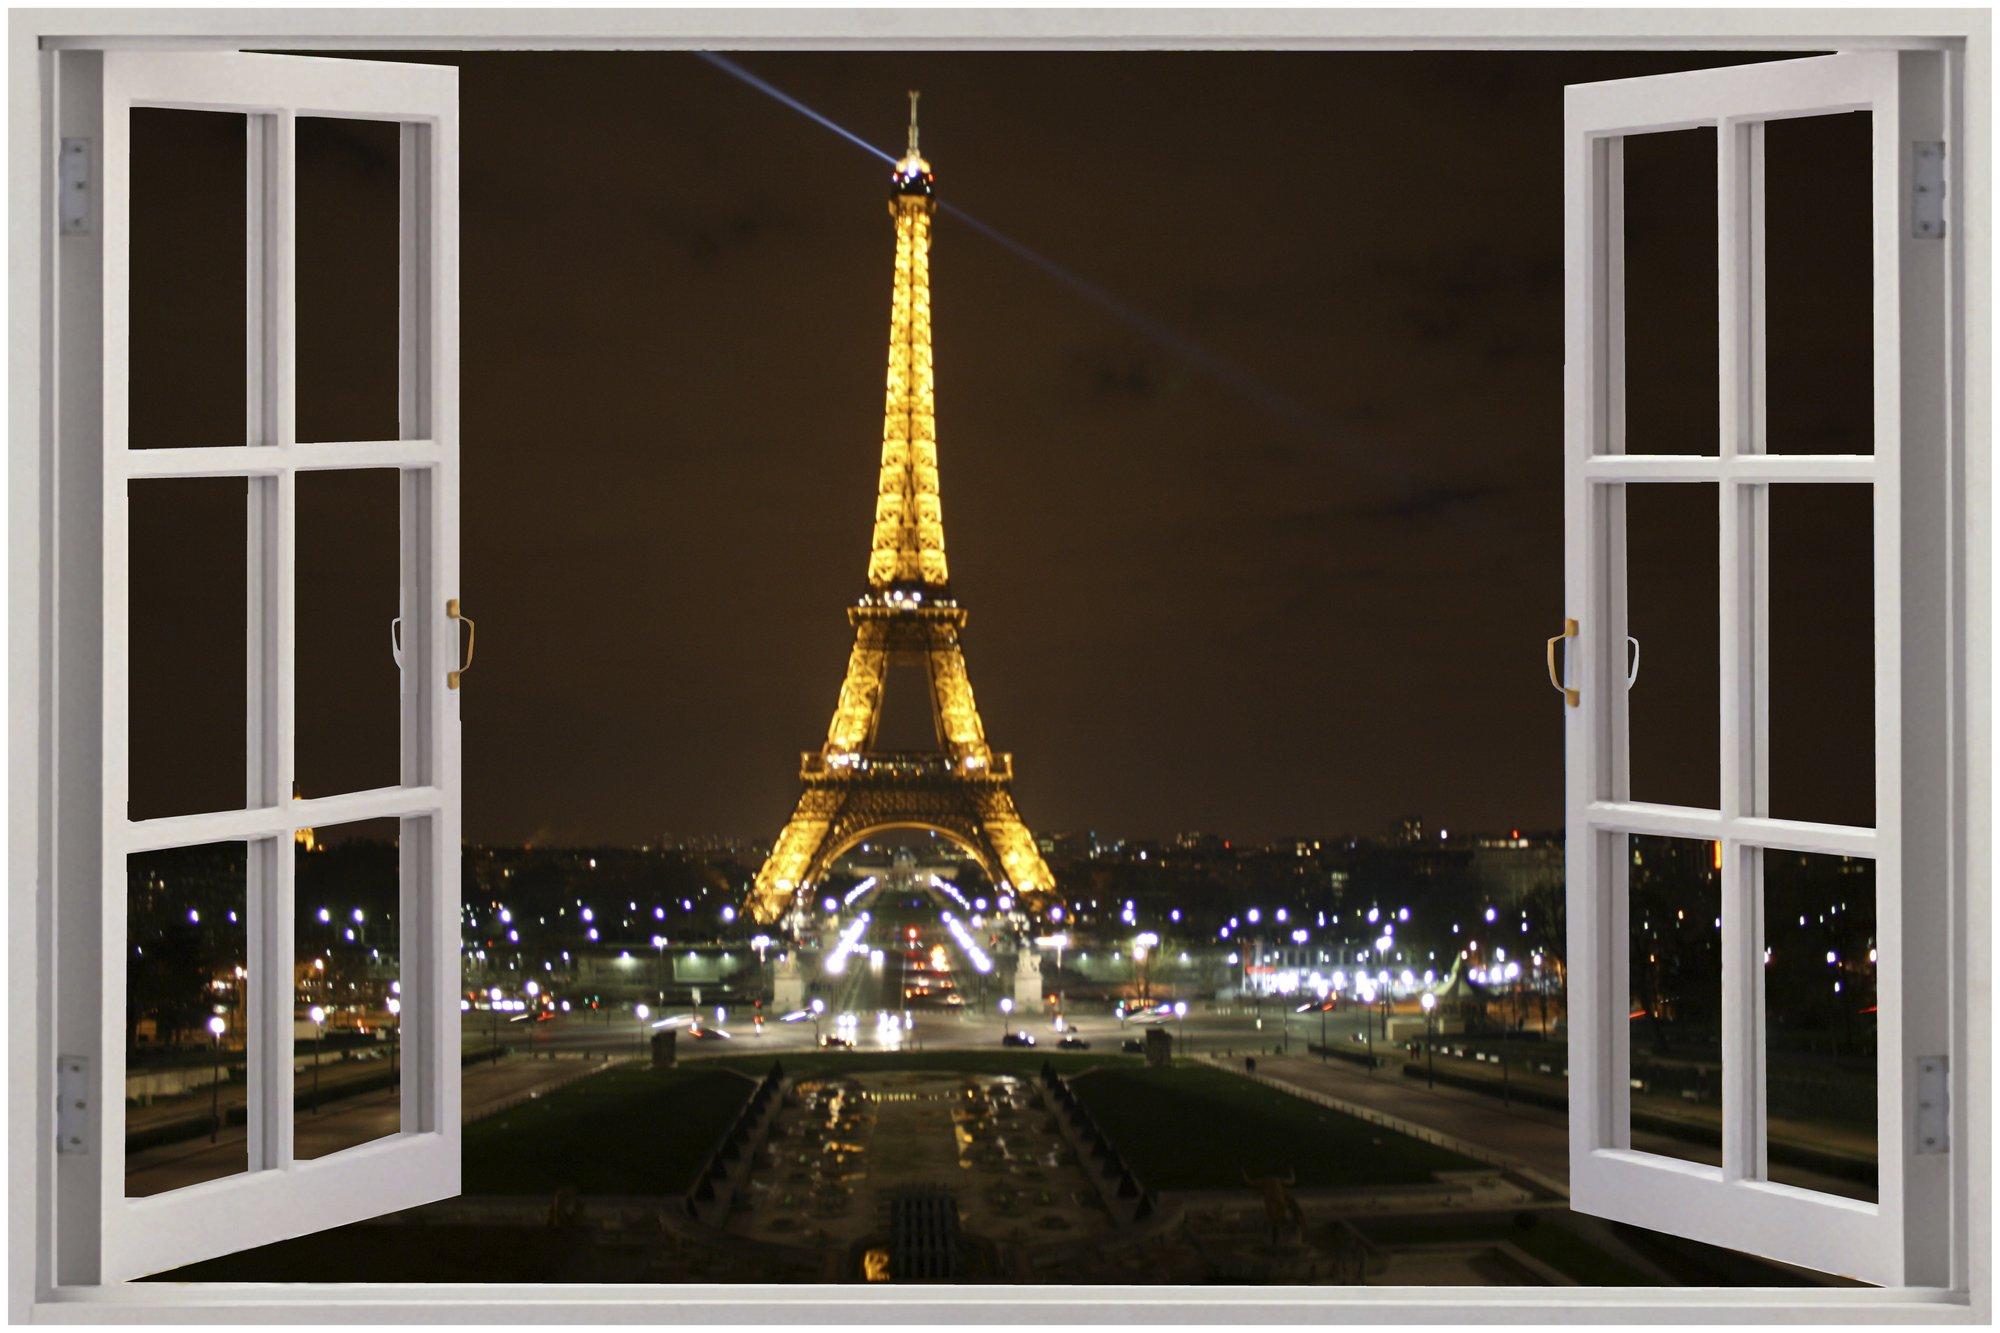 Window Eiffel Tower Paris View Wall Stickers Mural Art Decal Wallpaper 2000x1333